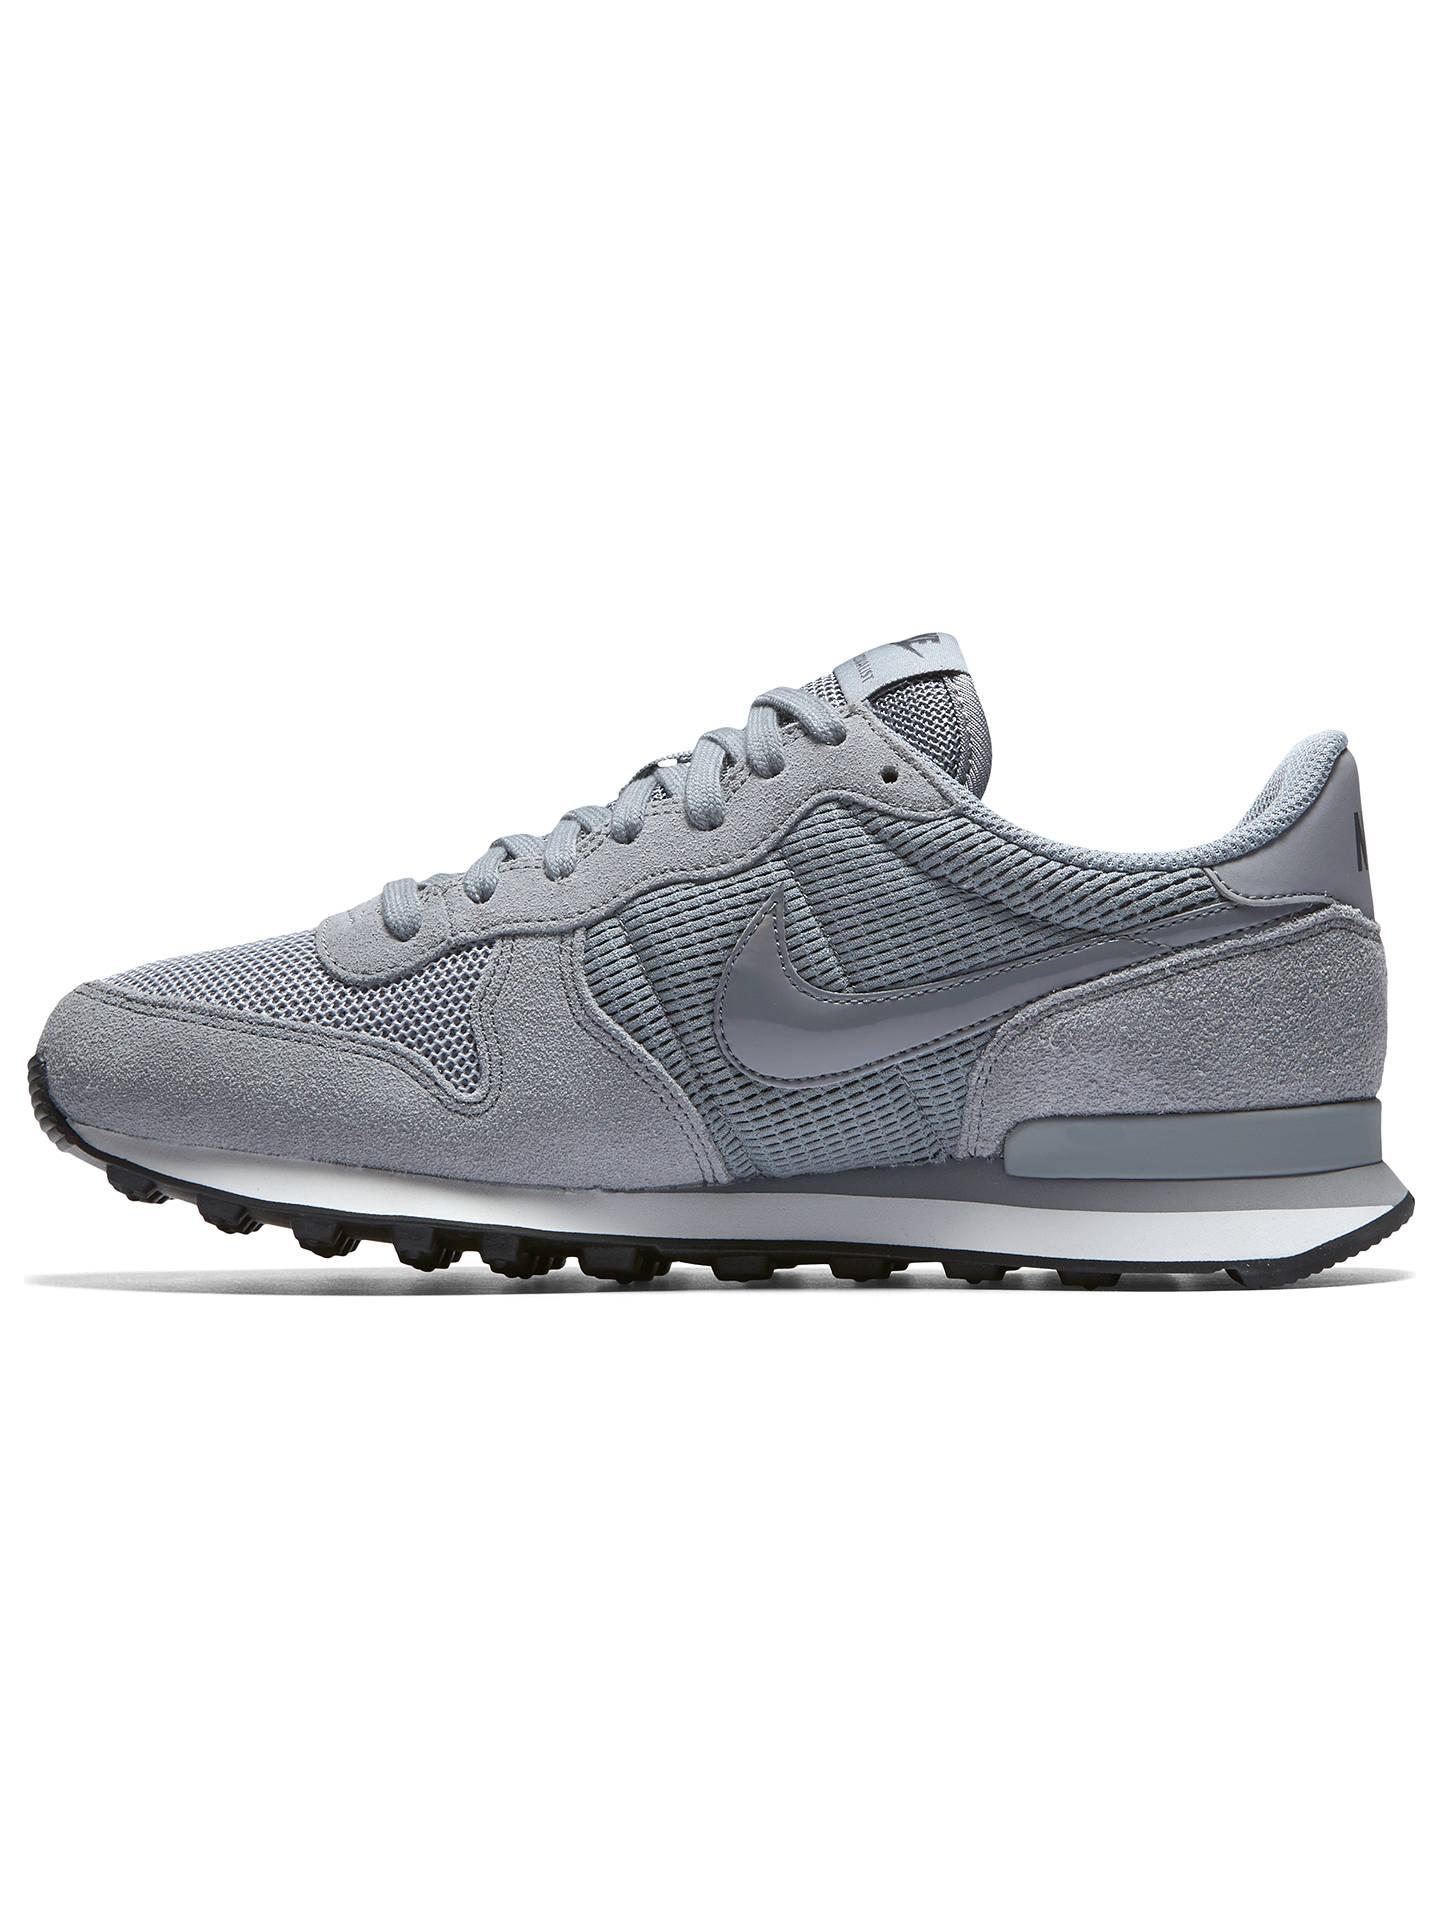 new style 96f91 ddc3a ... Buy Nike Internationalist Women s Trainers, Stealth Dark Grey Summit  White, 4 Online at ...